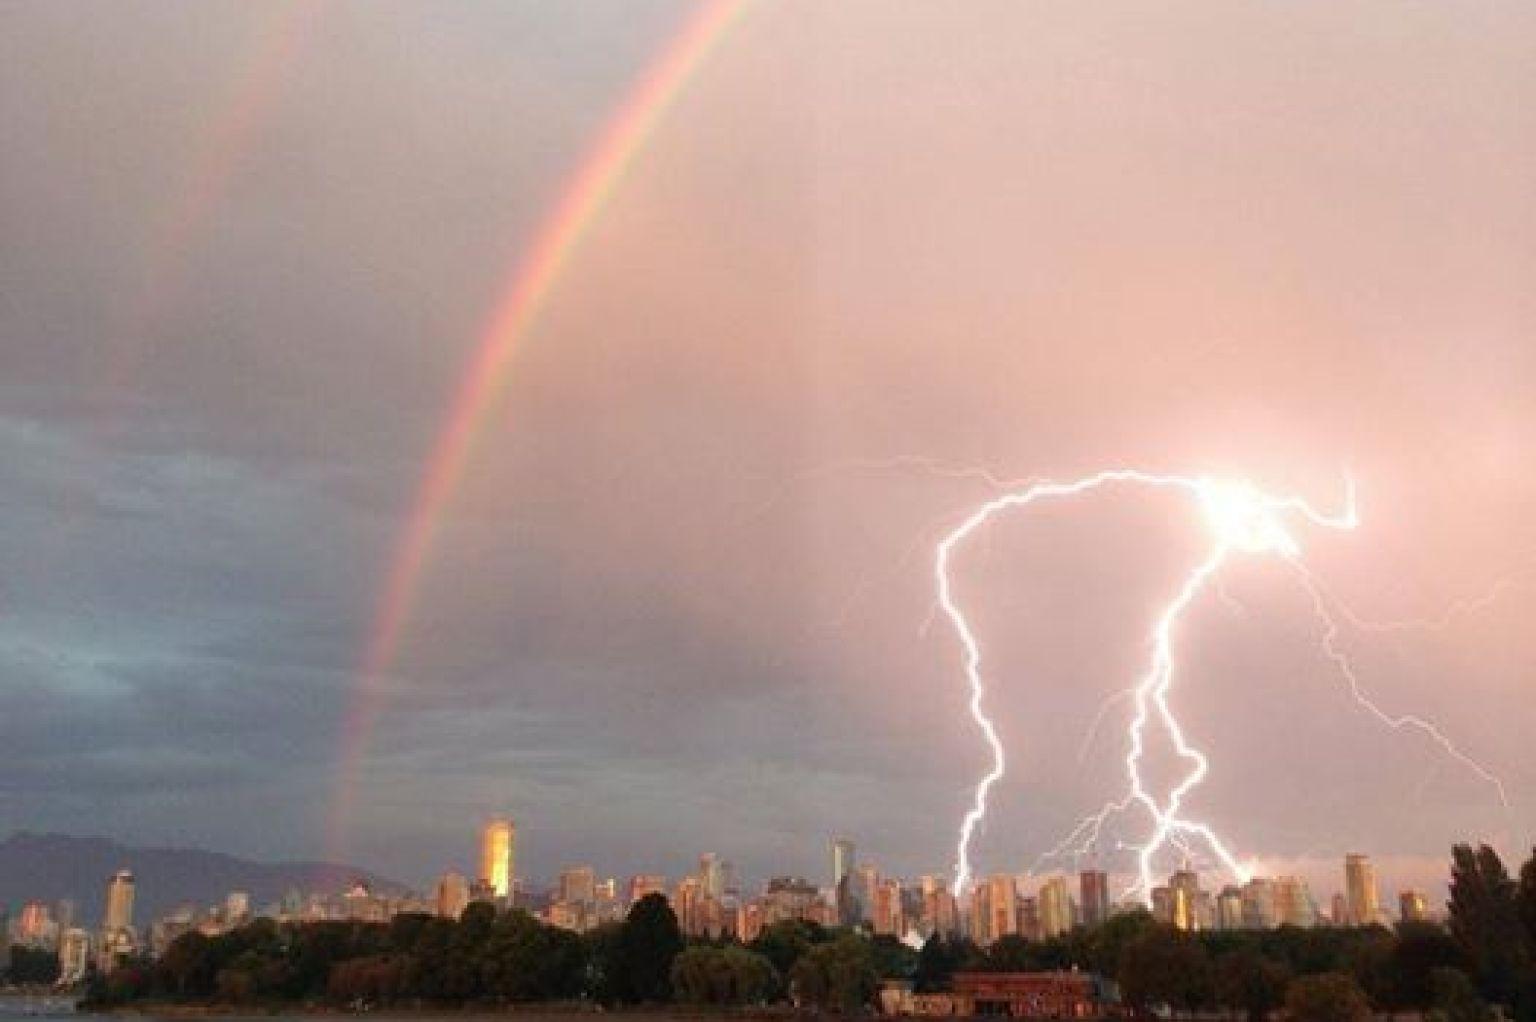 vancouver rain  lightning storm delays flights  cuts power